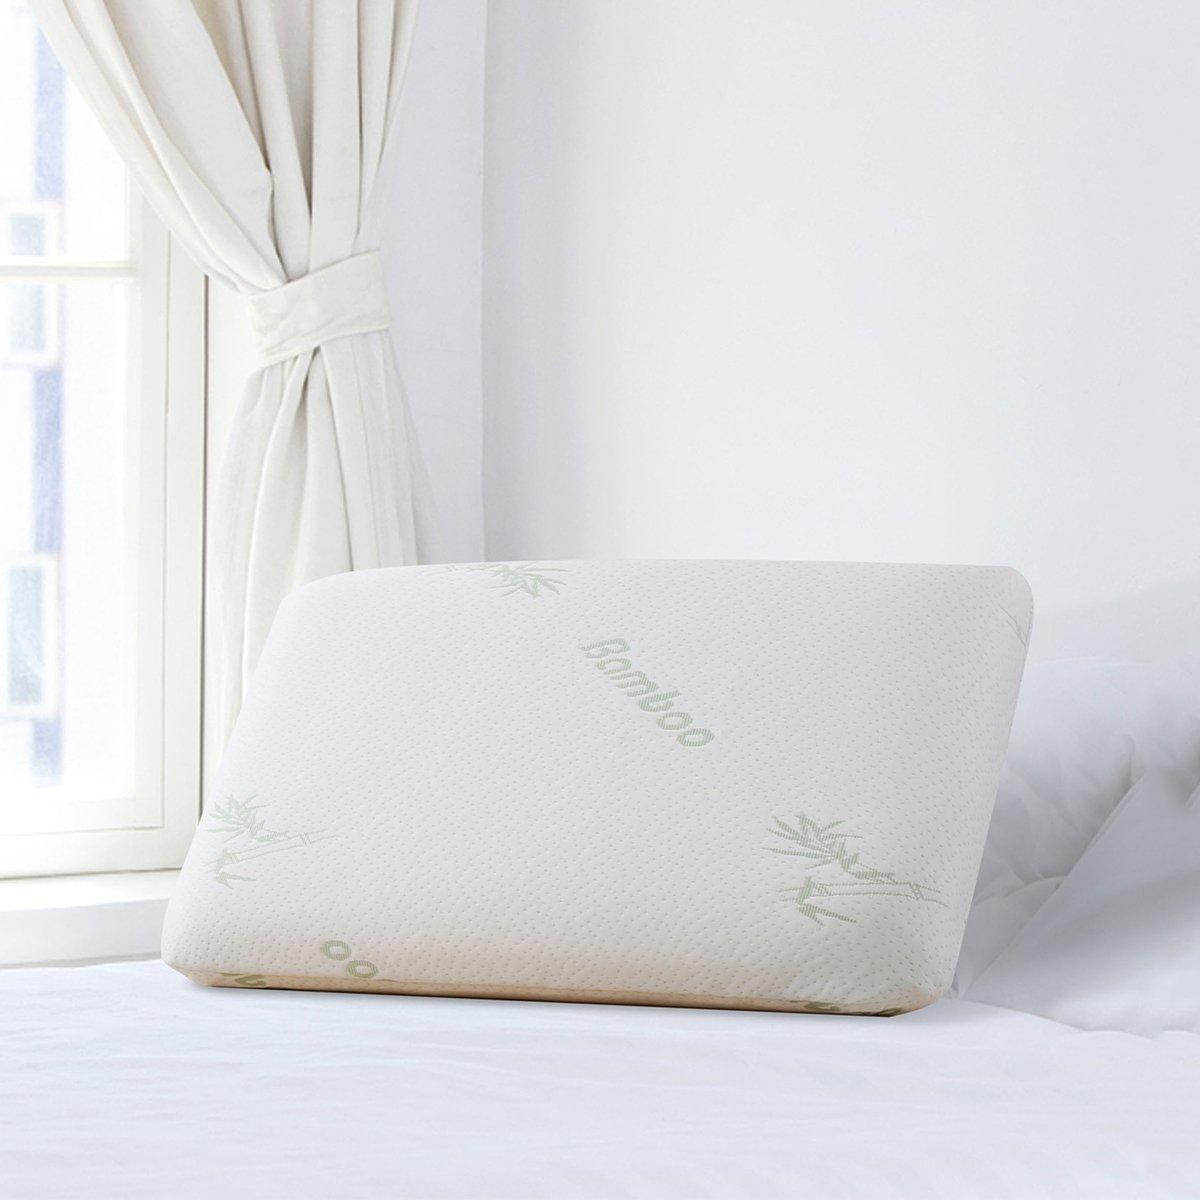 Ramada慢回弹太空记忆棉成人床上用品一对拍2面包记忆枕护颈椎枕头枕芯PL171017